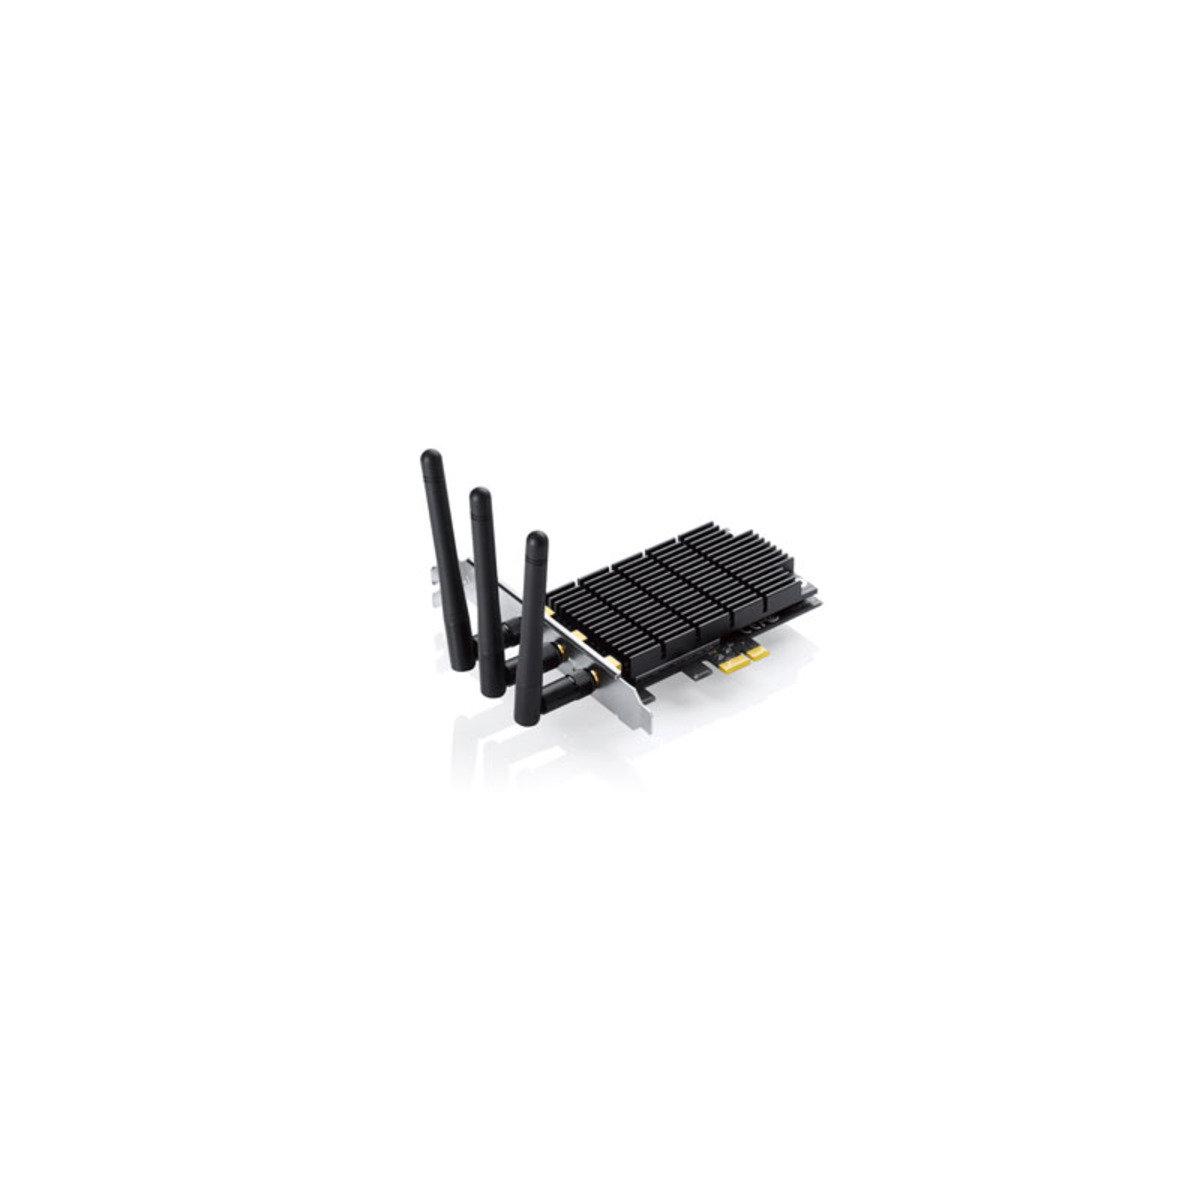 AC1900 無線雙頻PC內置高效能接收卡 T9E